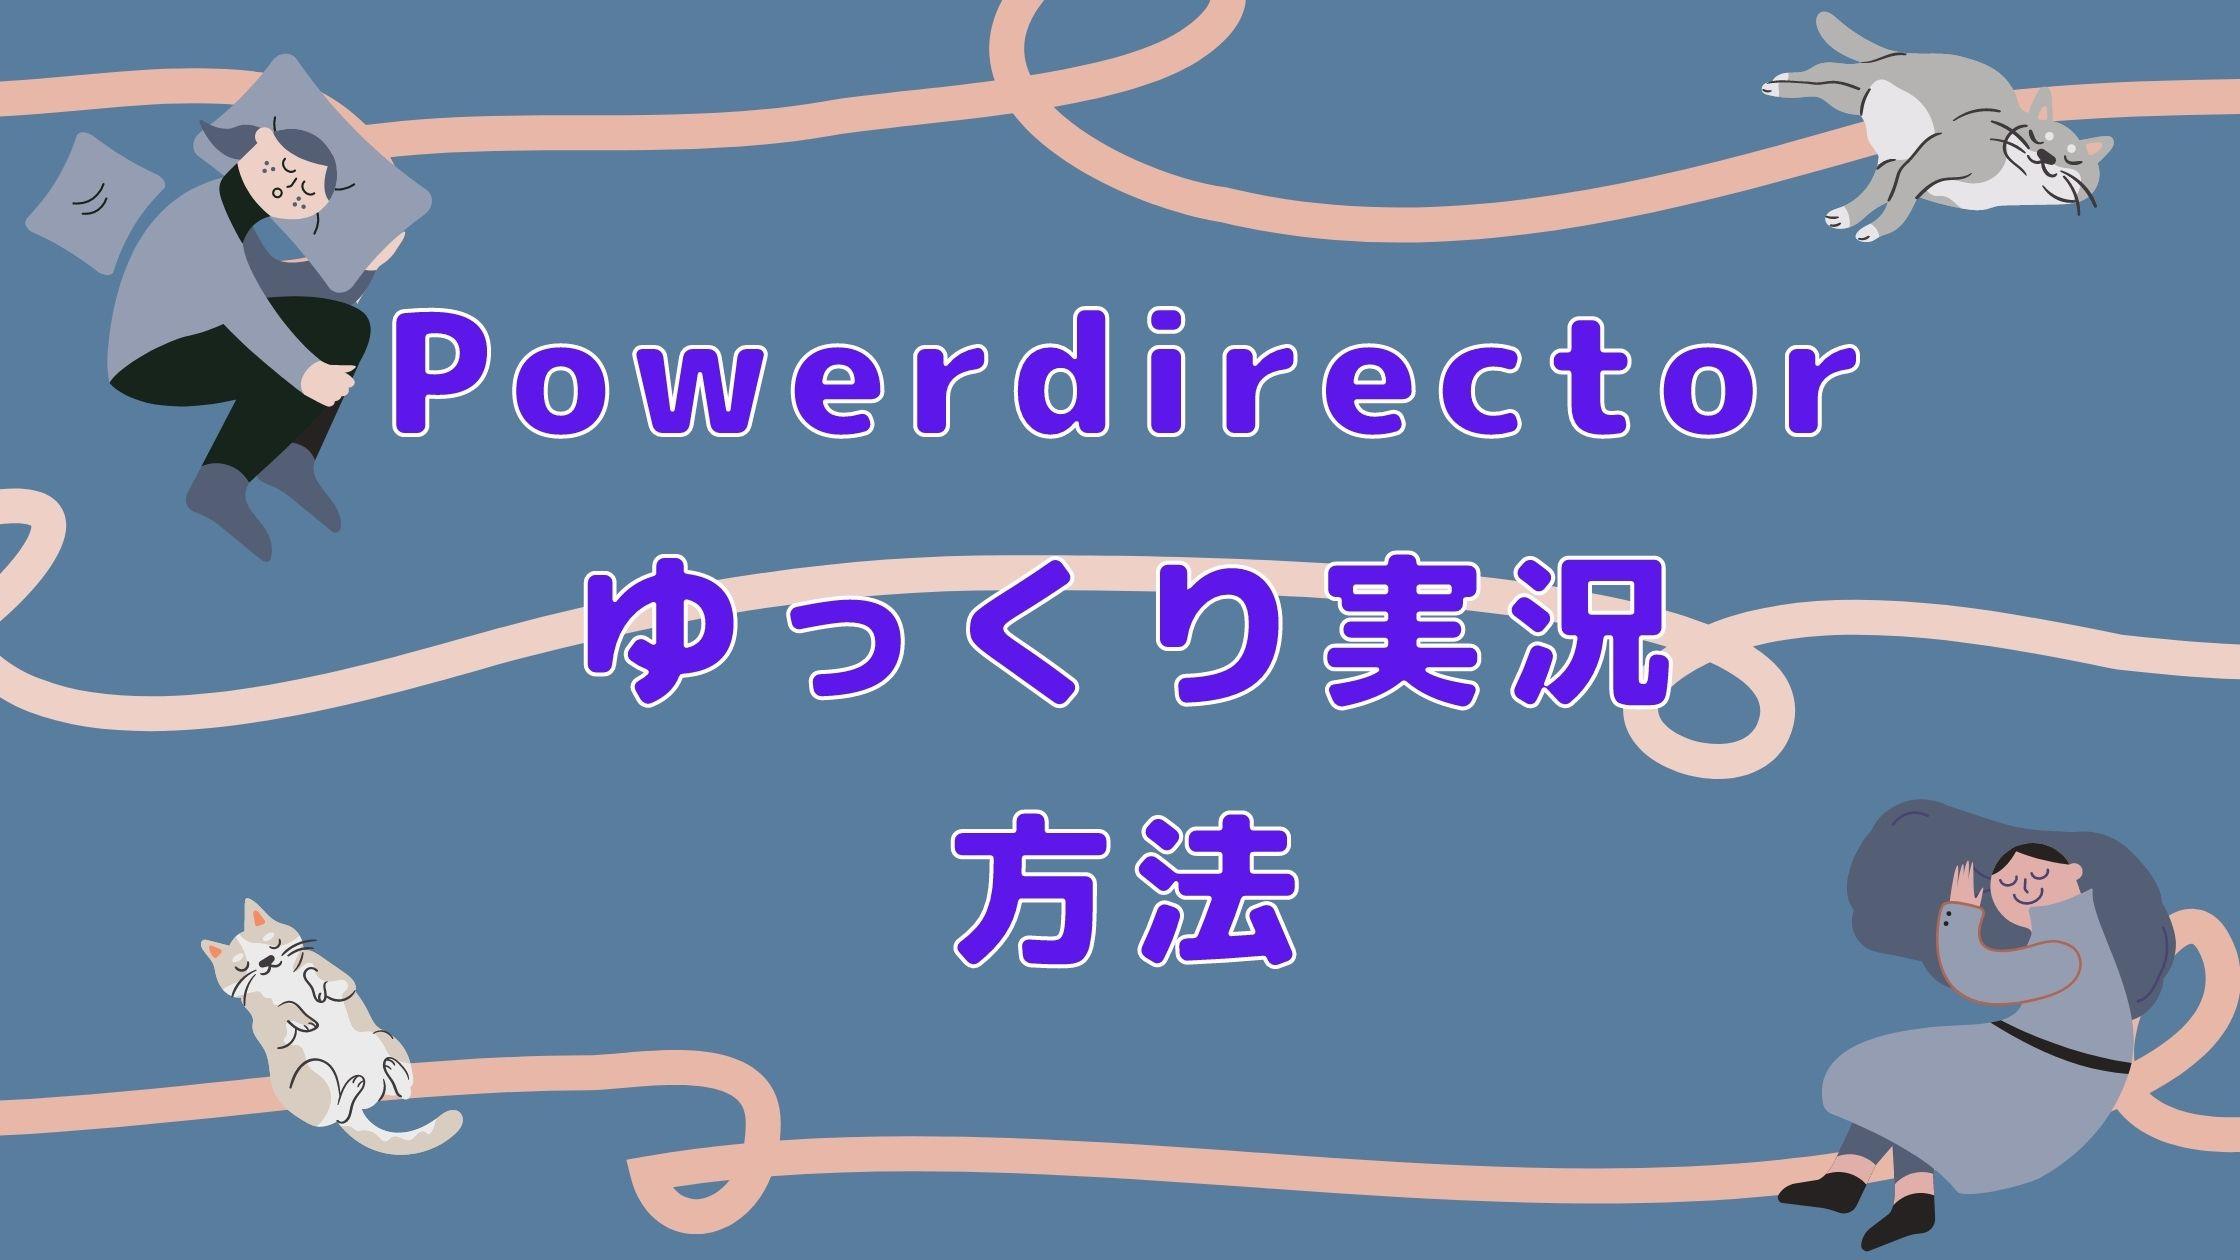 Power directorでゆっくり実況の方法